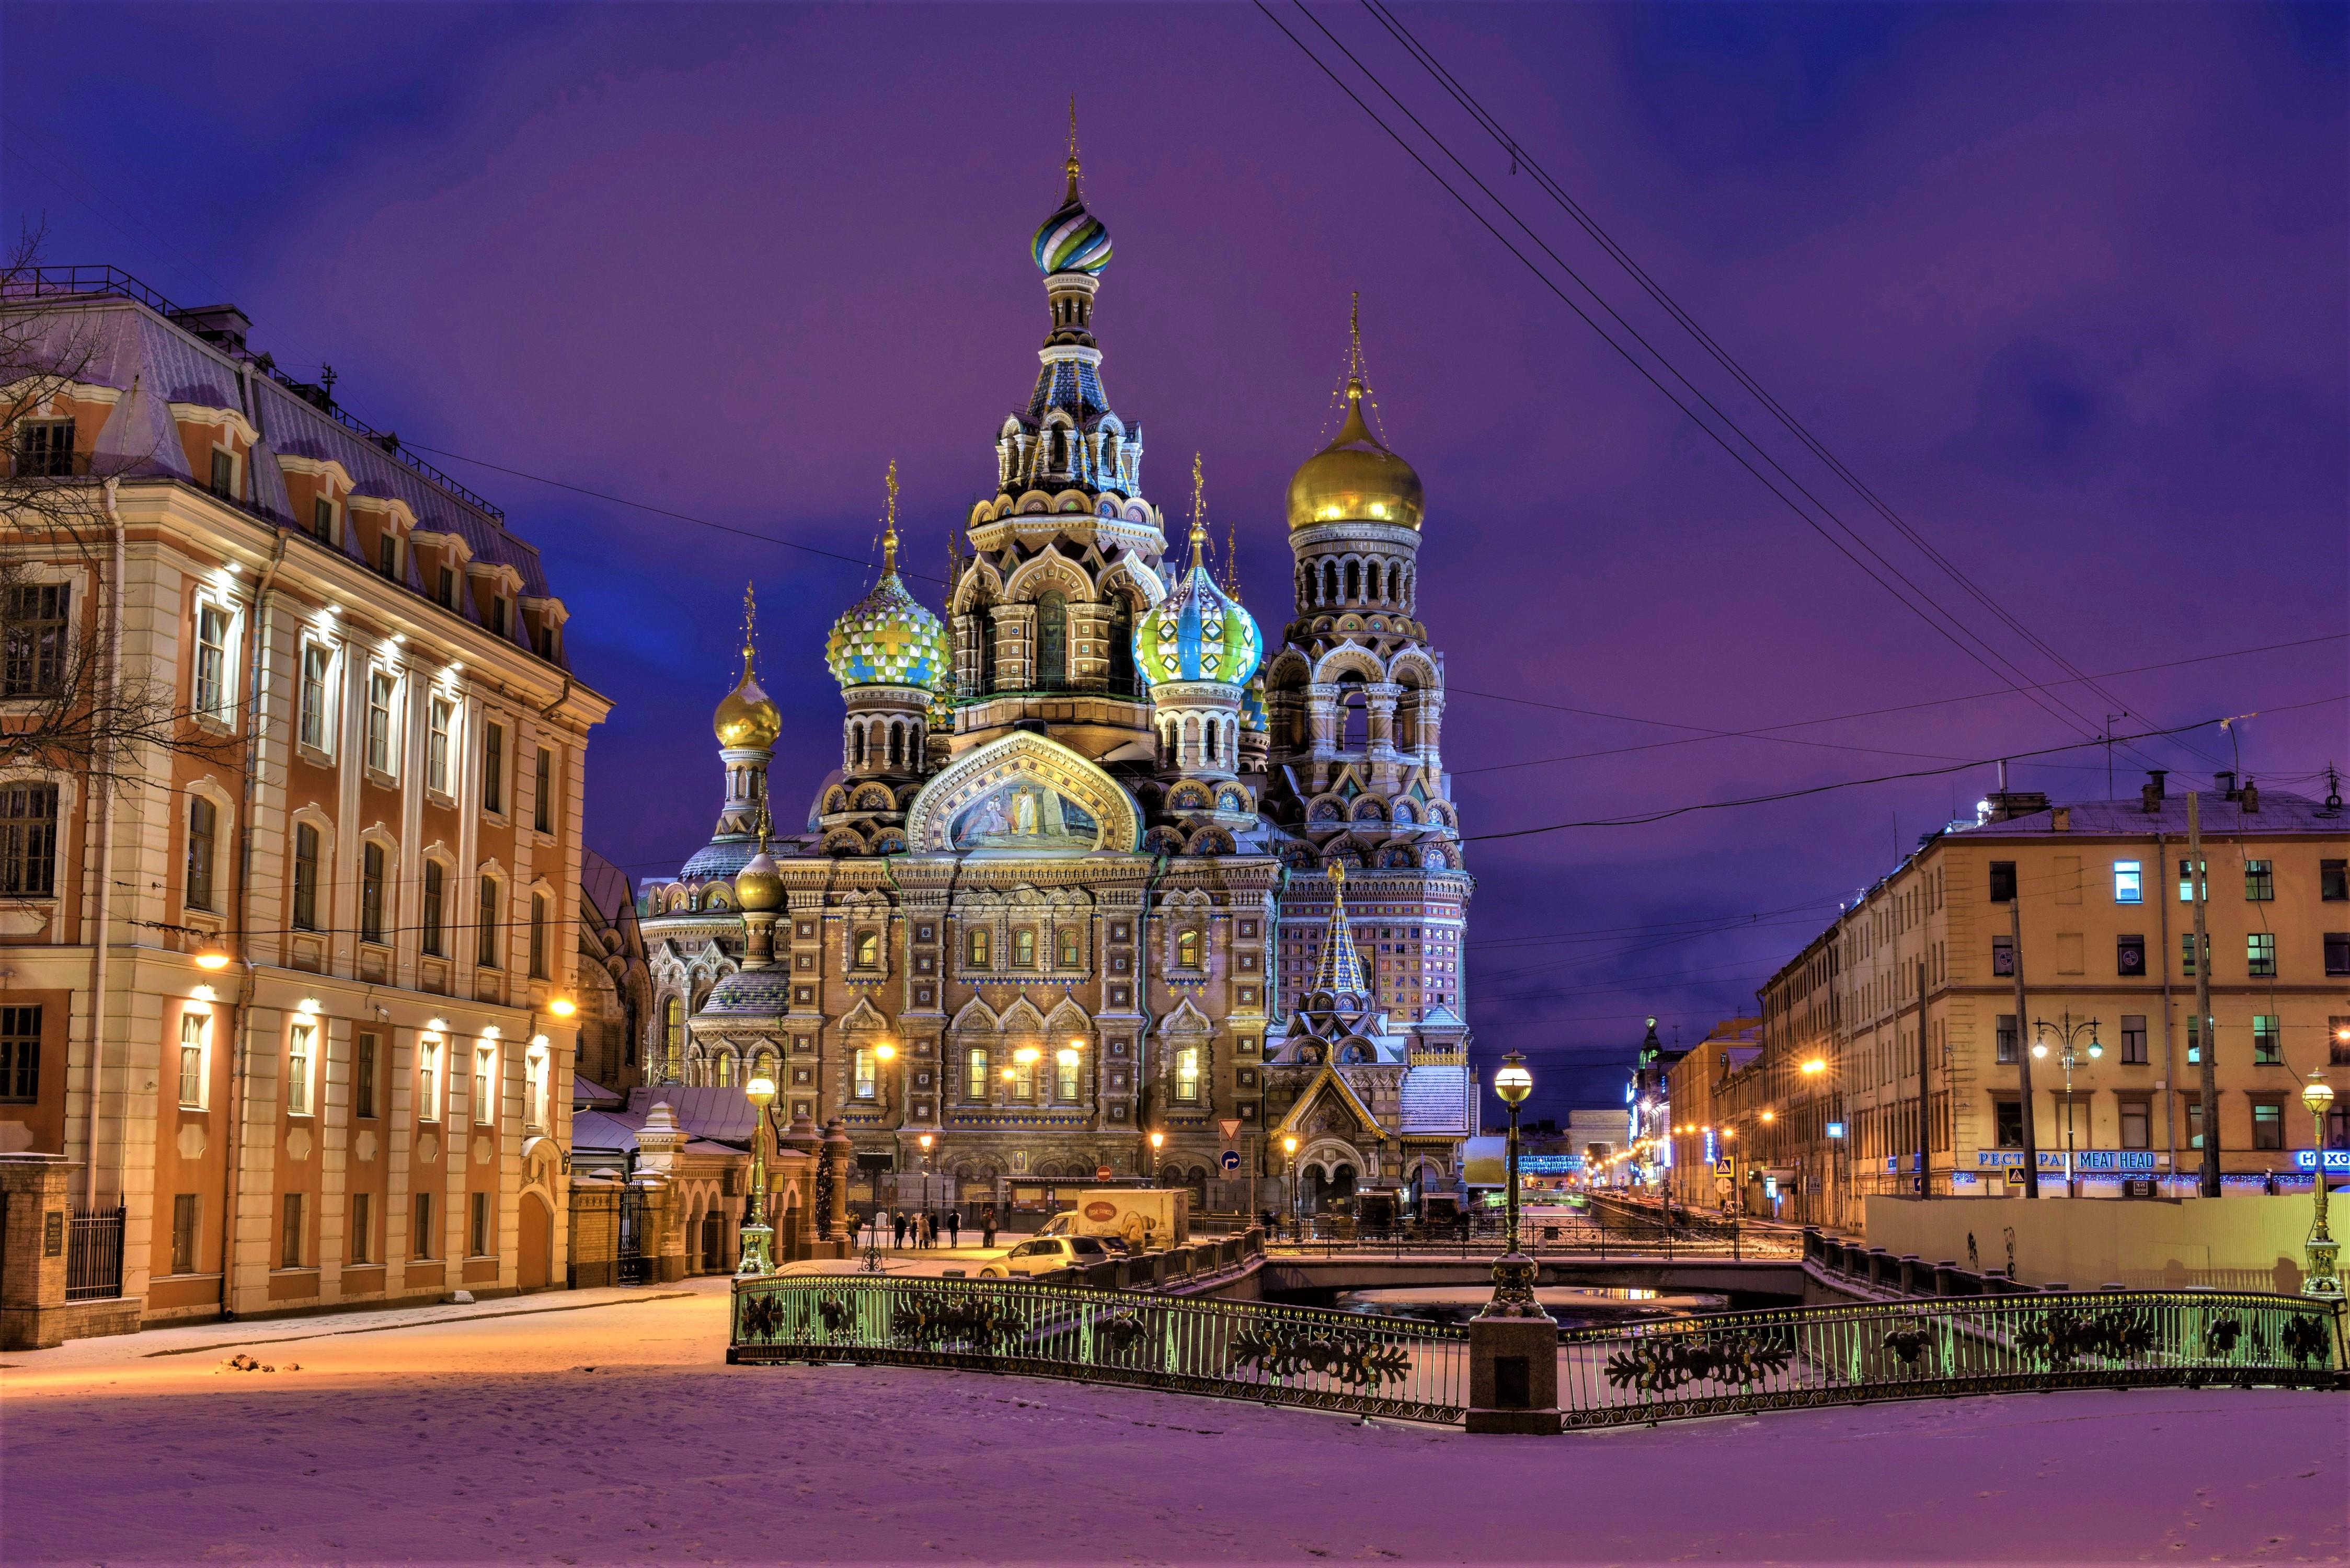 Architecture Church Russia Saint Petersburg Square 4495x3000